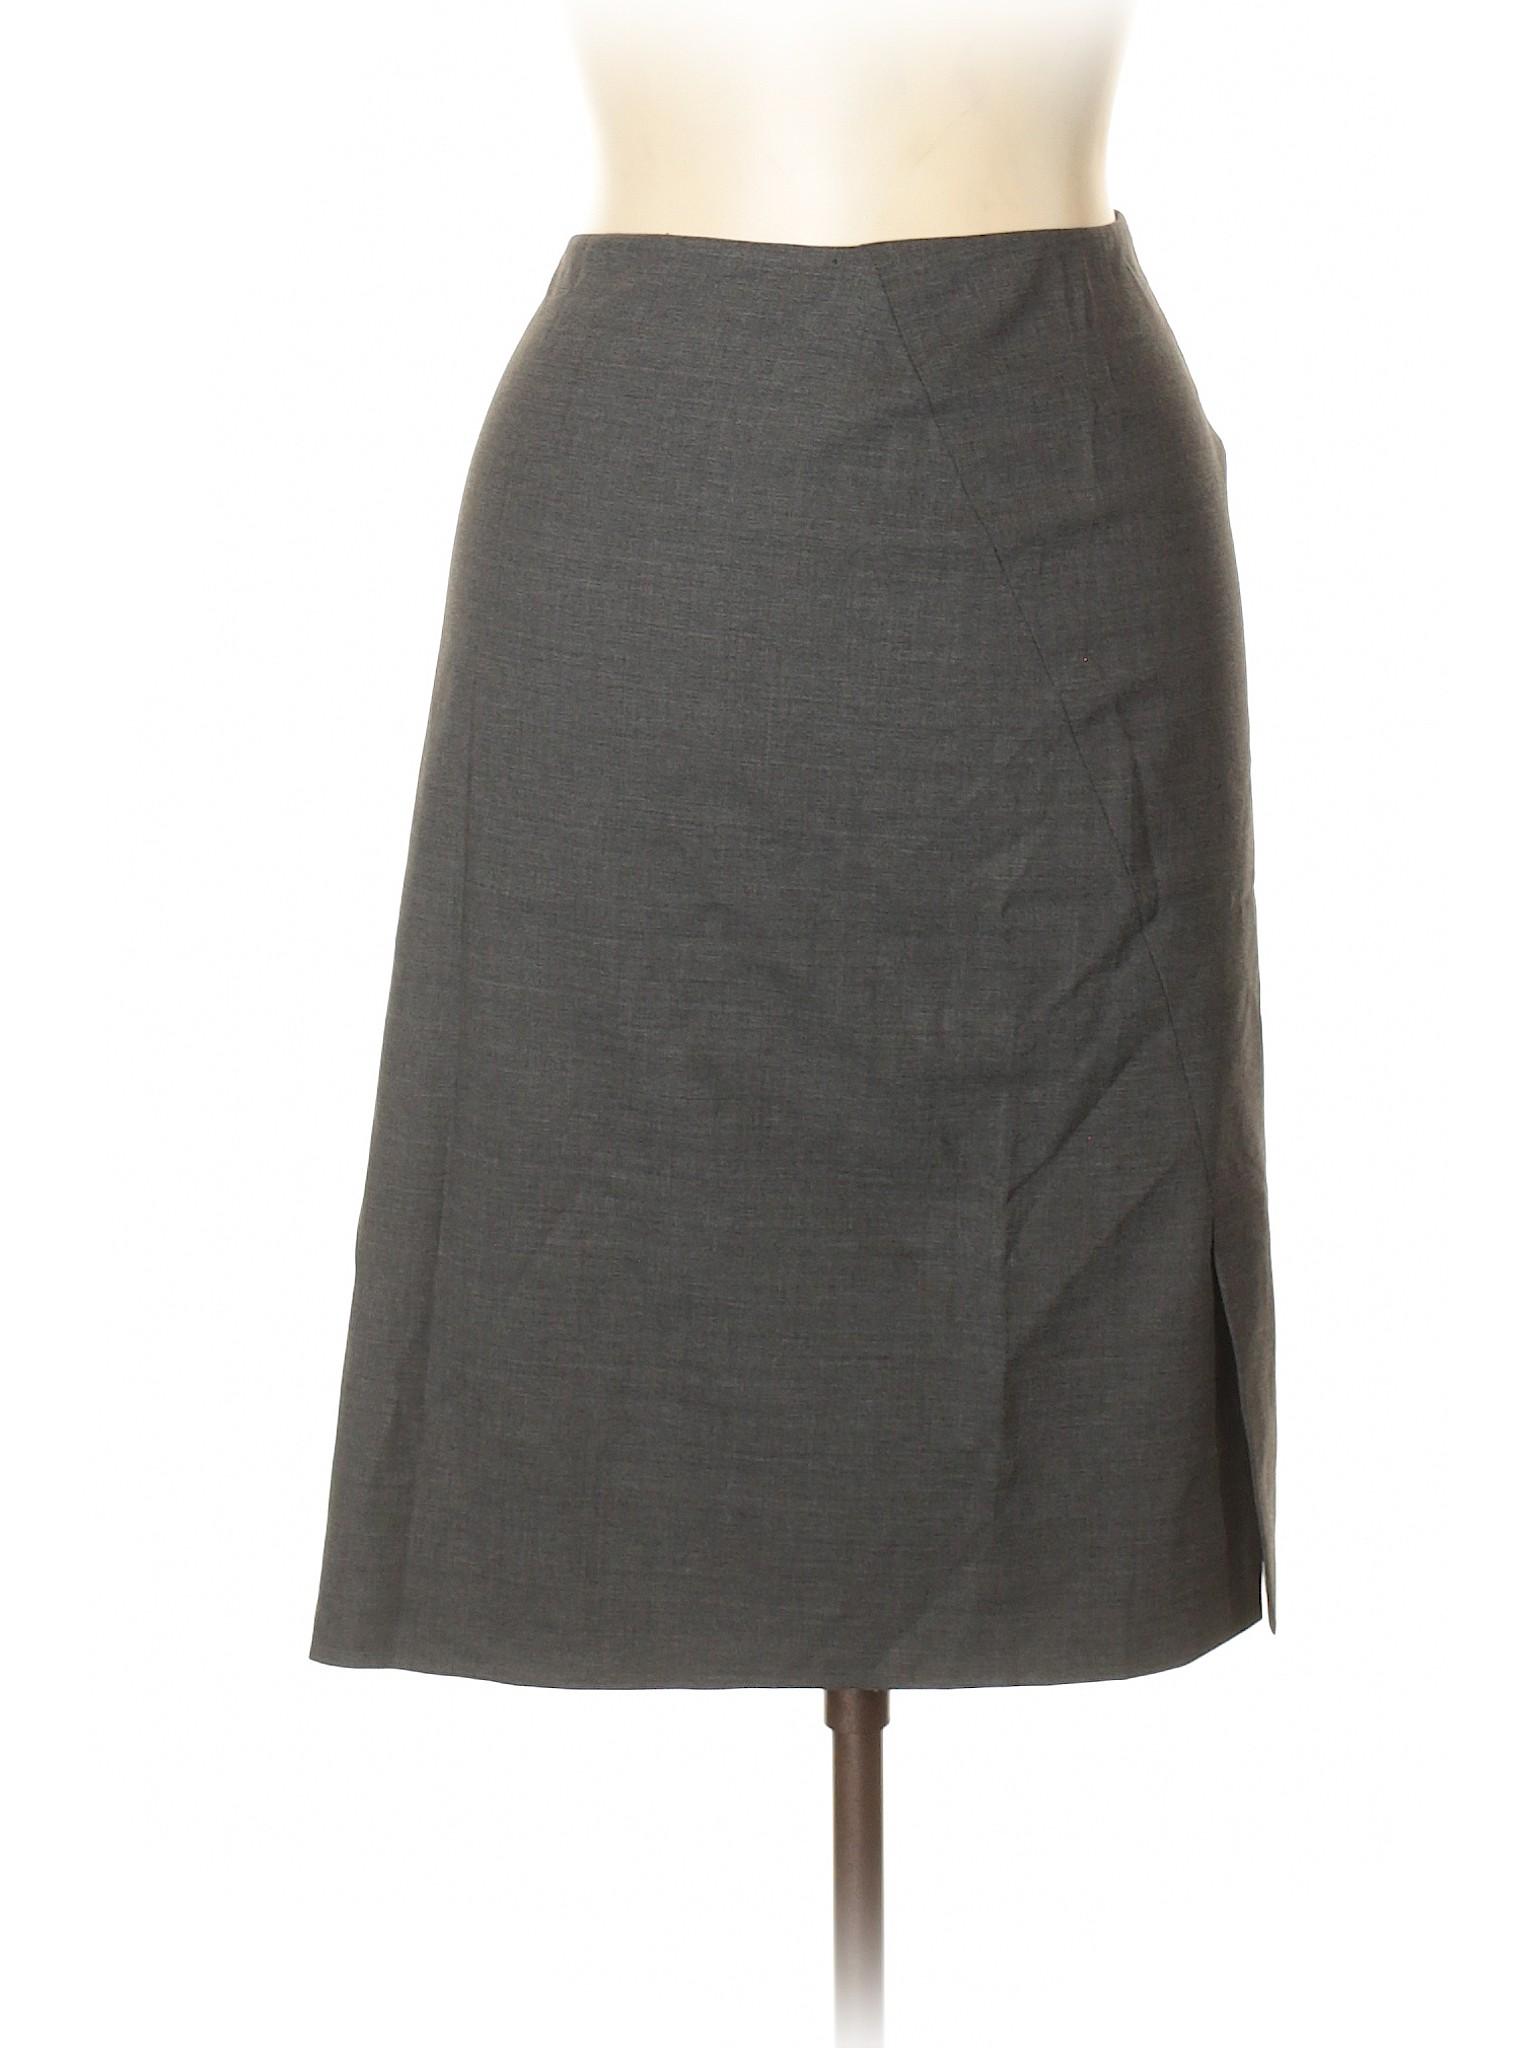 Skirt Wool Boutique Wool Skirt Boutique Boutique Wool R8PBPq